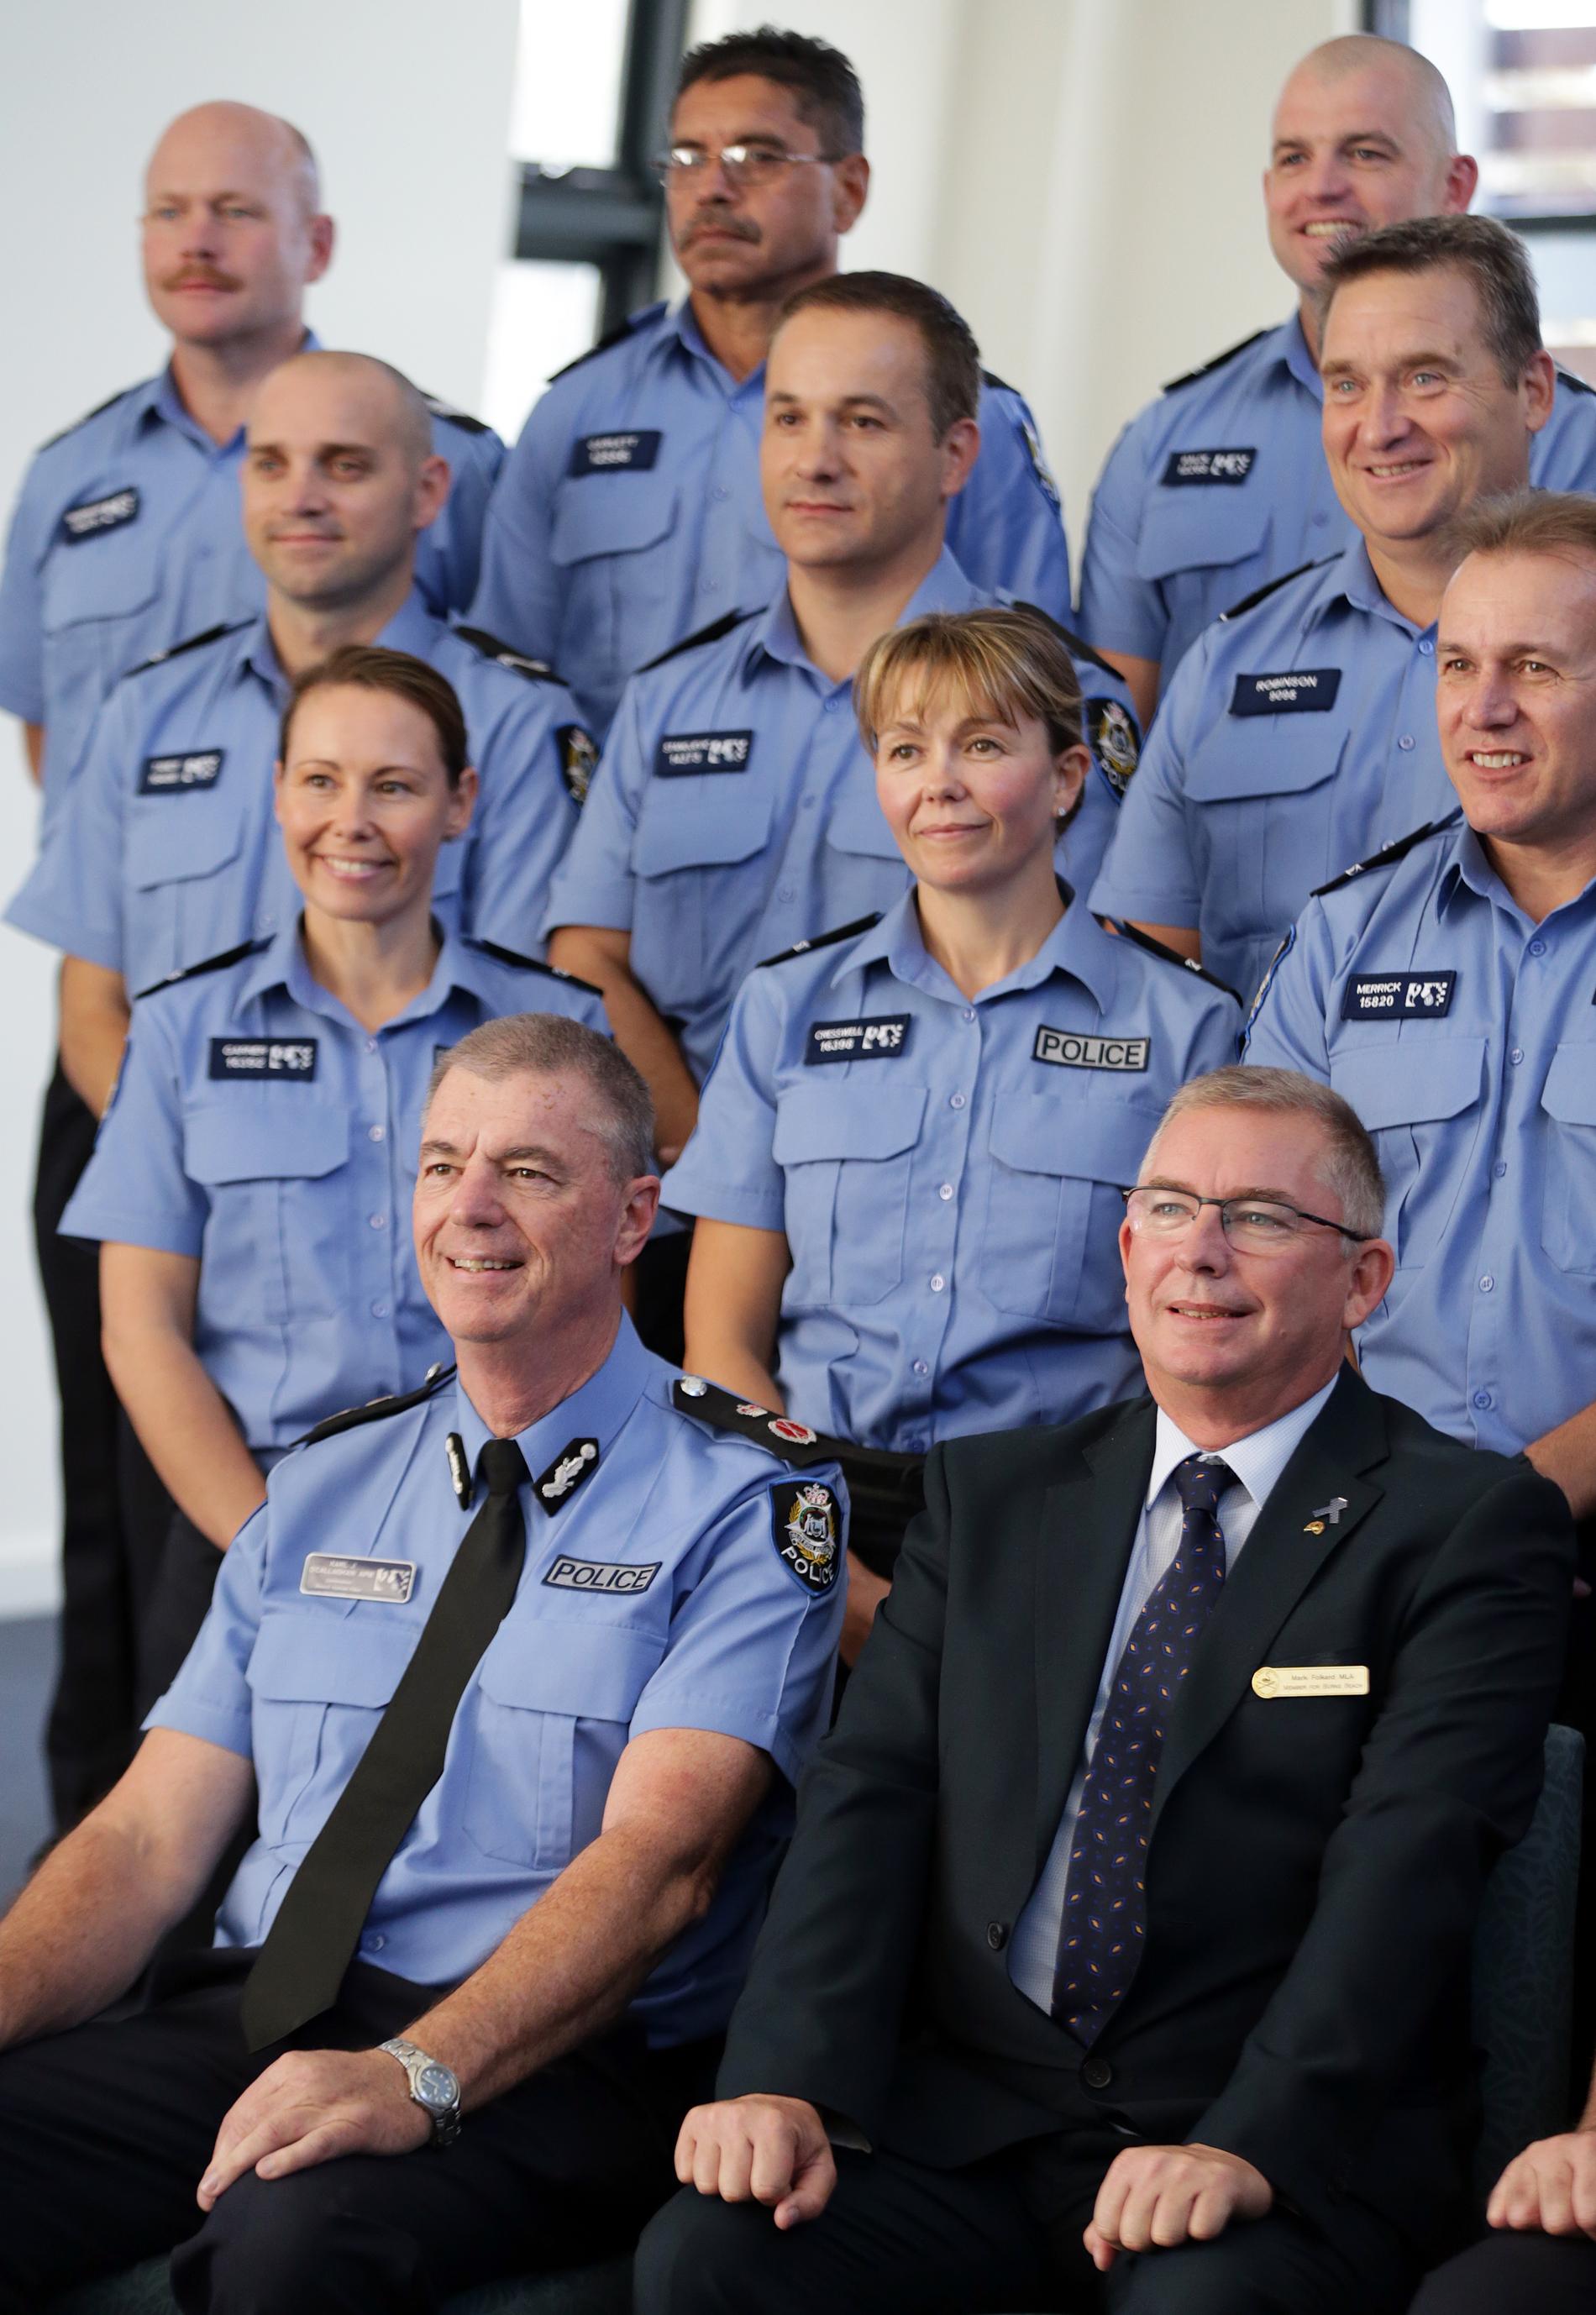 Police Commissioner Karl O'Callaghan and Burns Beach MLA Mark Folkhard with graduates.